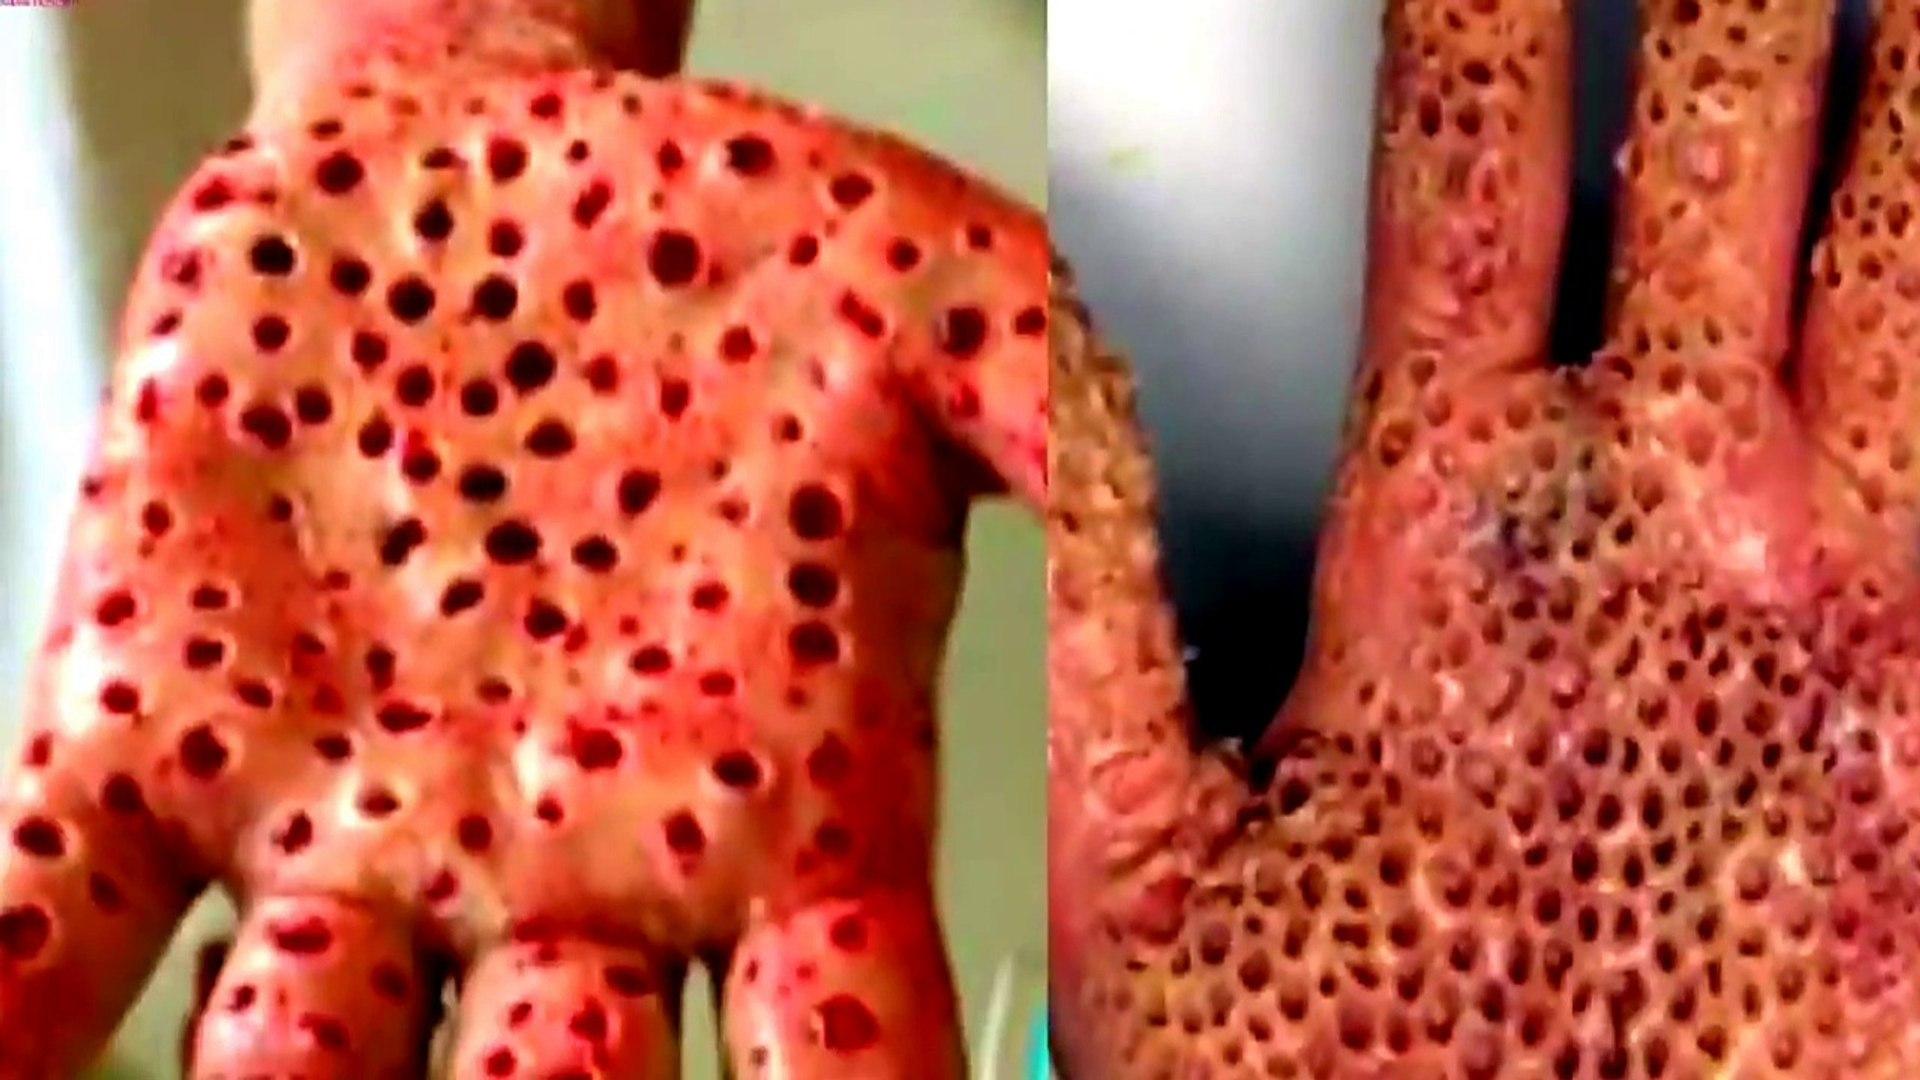 CoronaVirus Rumors in Hindi | Facts about Corona Virus| CoronaVirus Update in Hindi | कोरोना वायरस